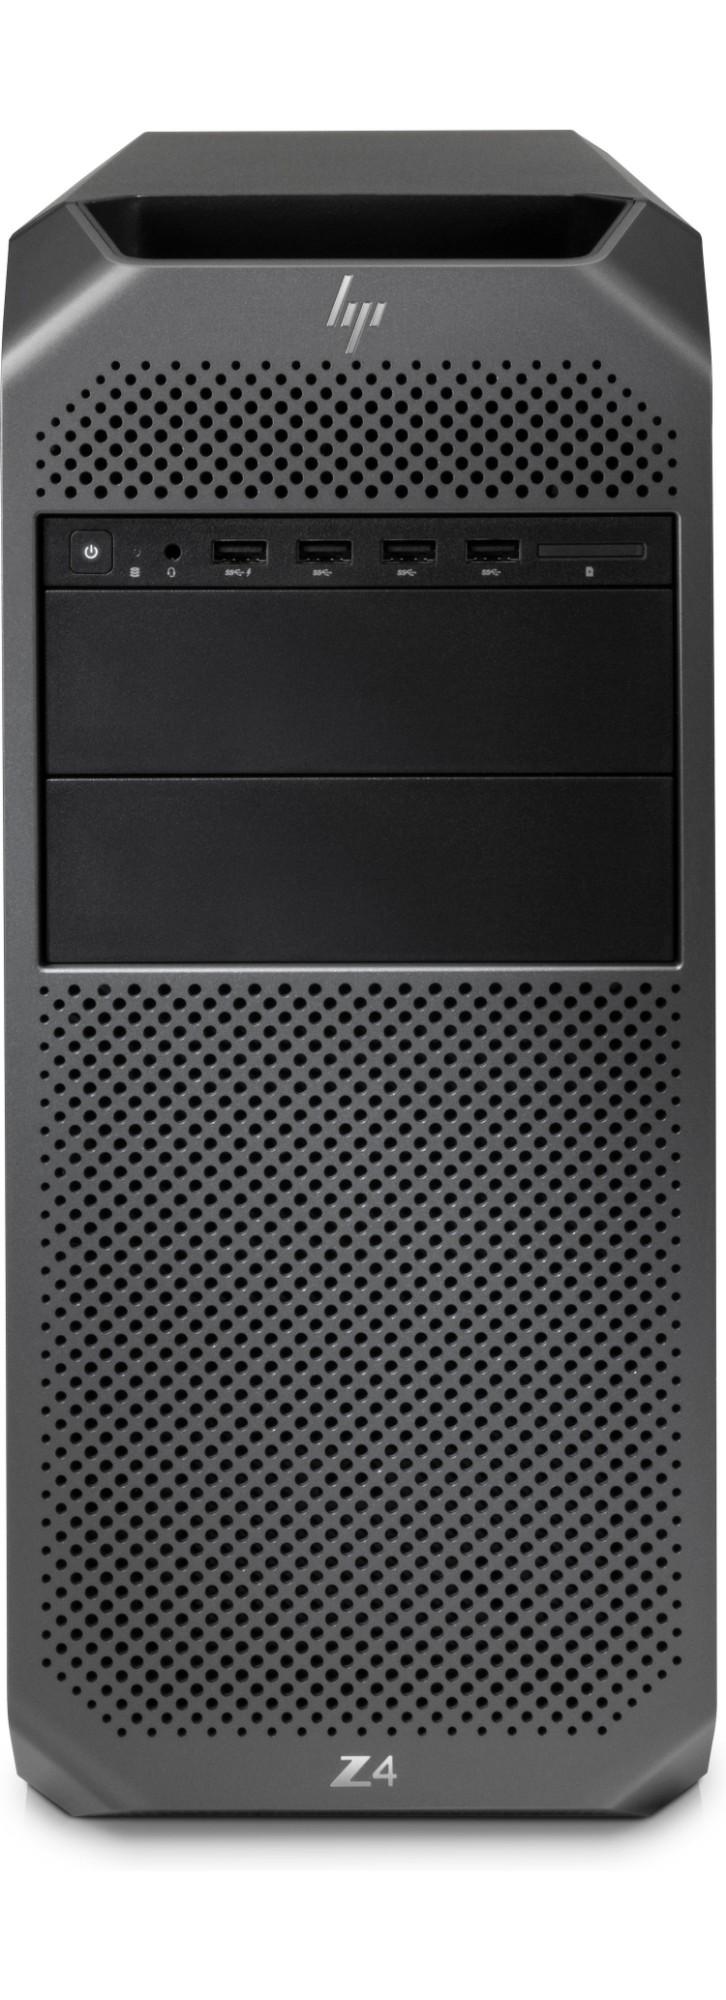 HP Workstation Z4 G4 2WU66EA#ABU PCs/Workstations